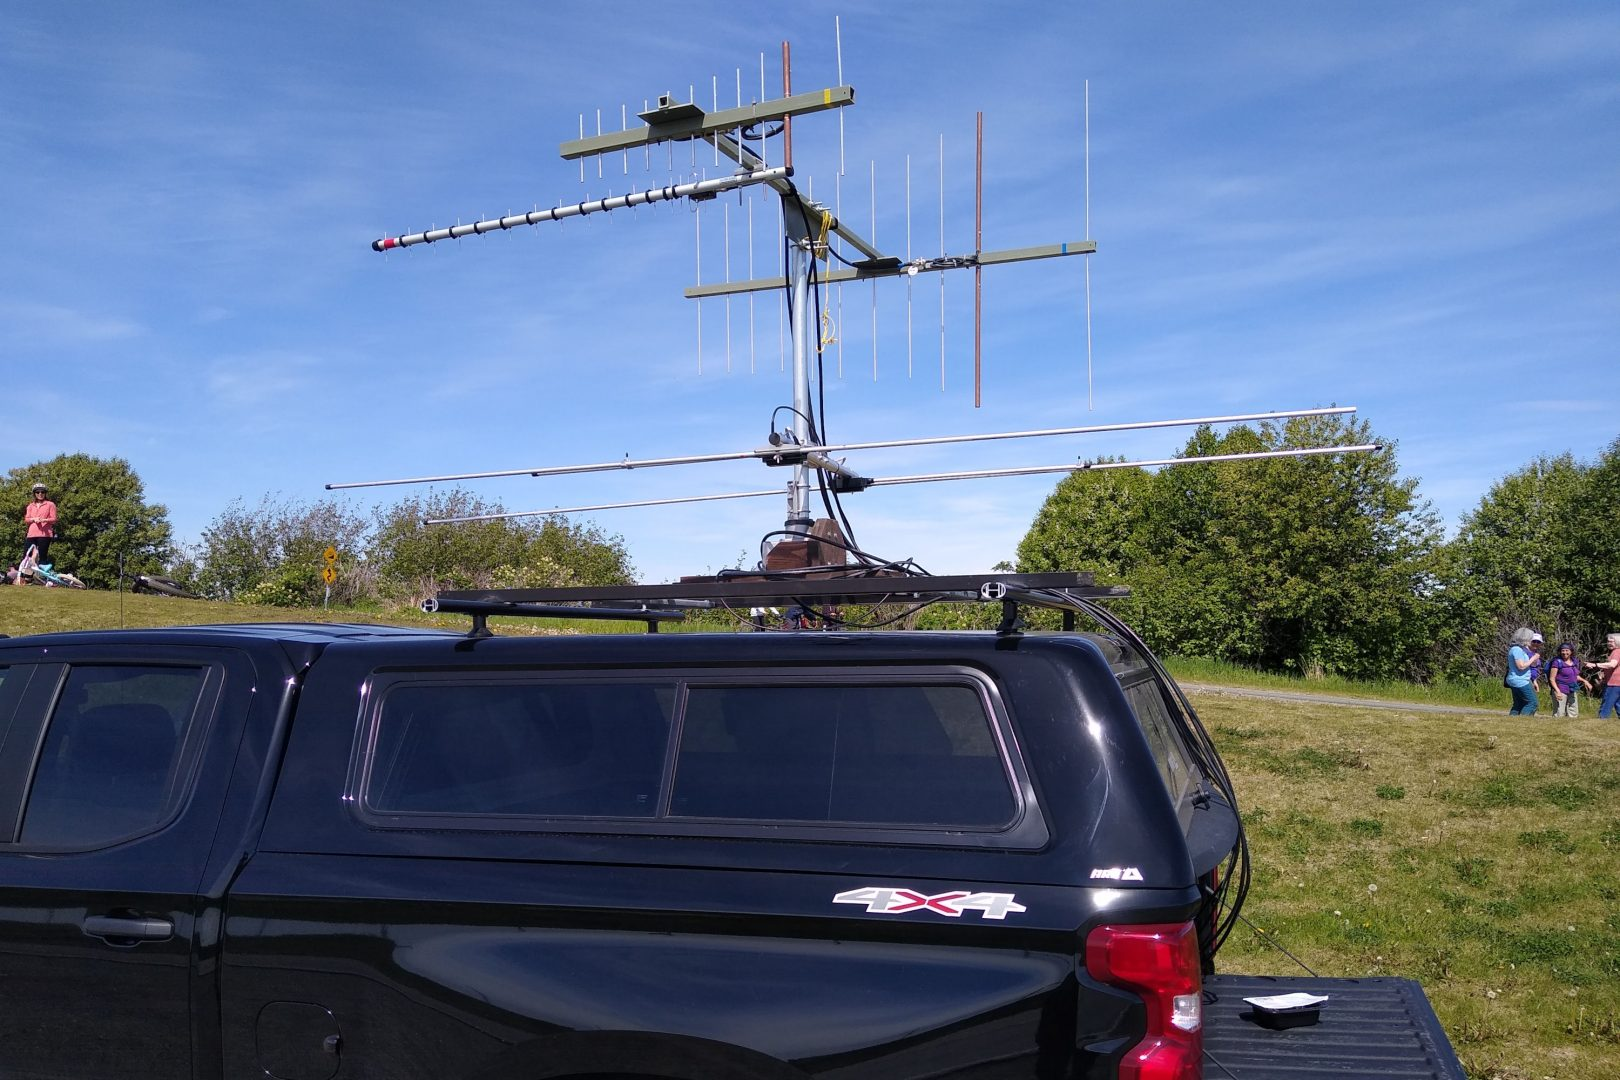 Ham radio rover station set up at Point Woronzof, Alaska